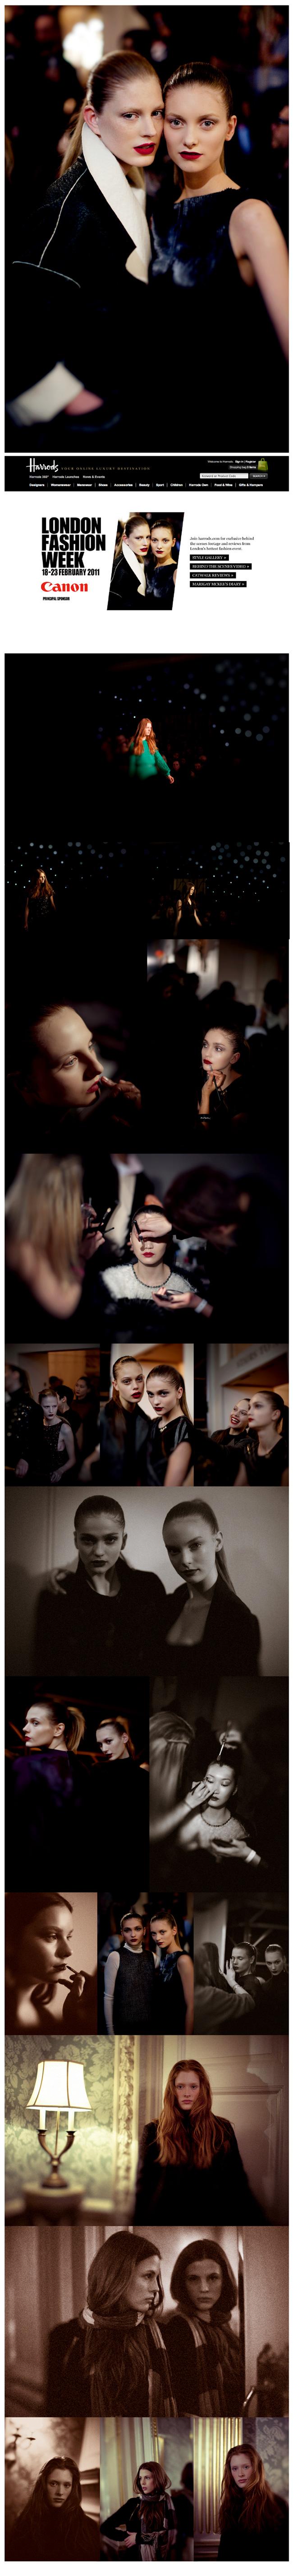 London Fashion Week - Sophie Laslett Photography - Freelance Photographer